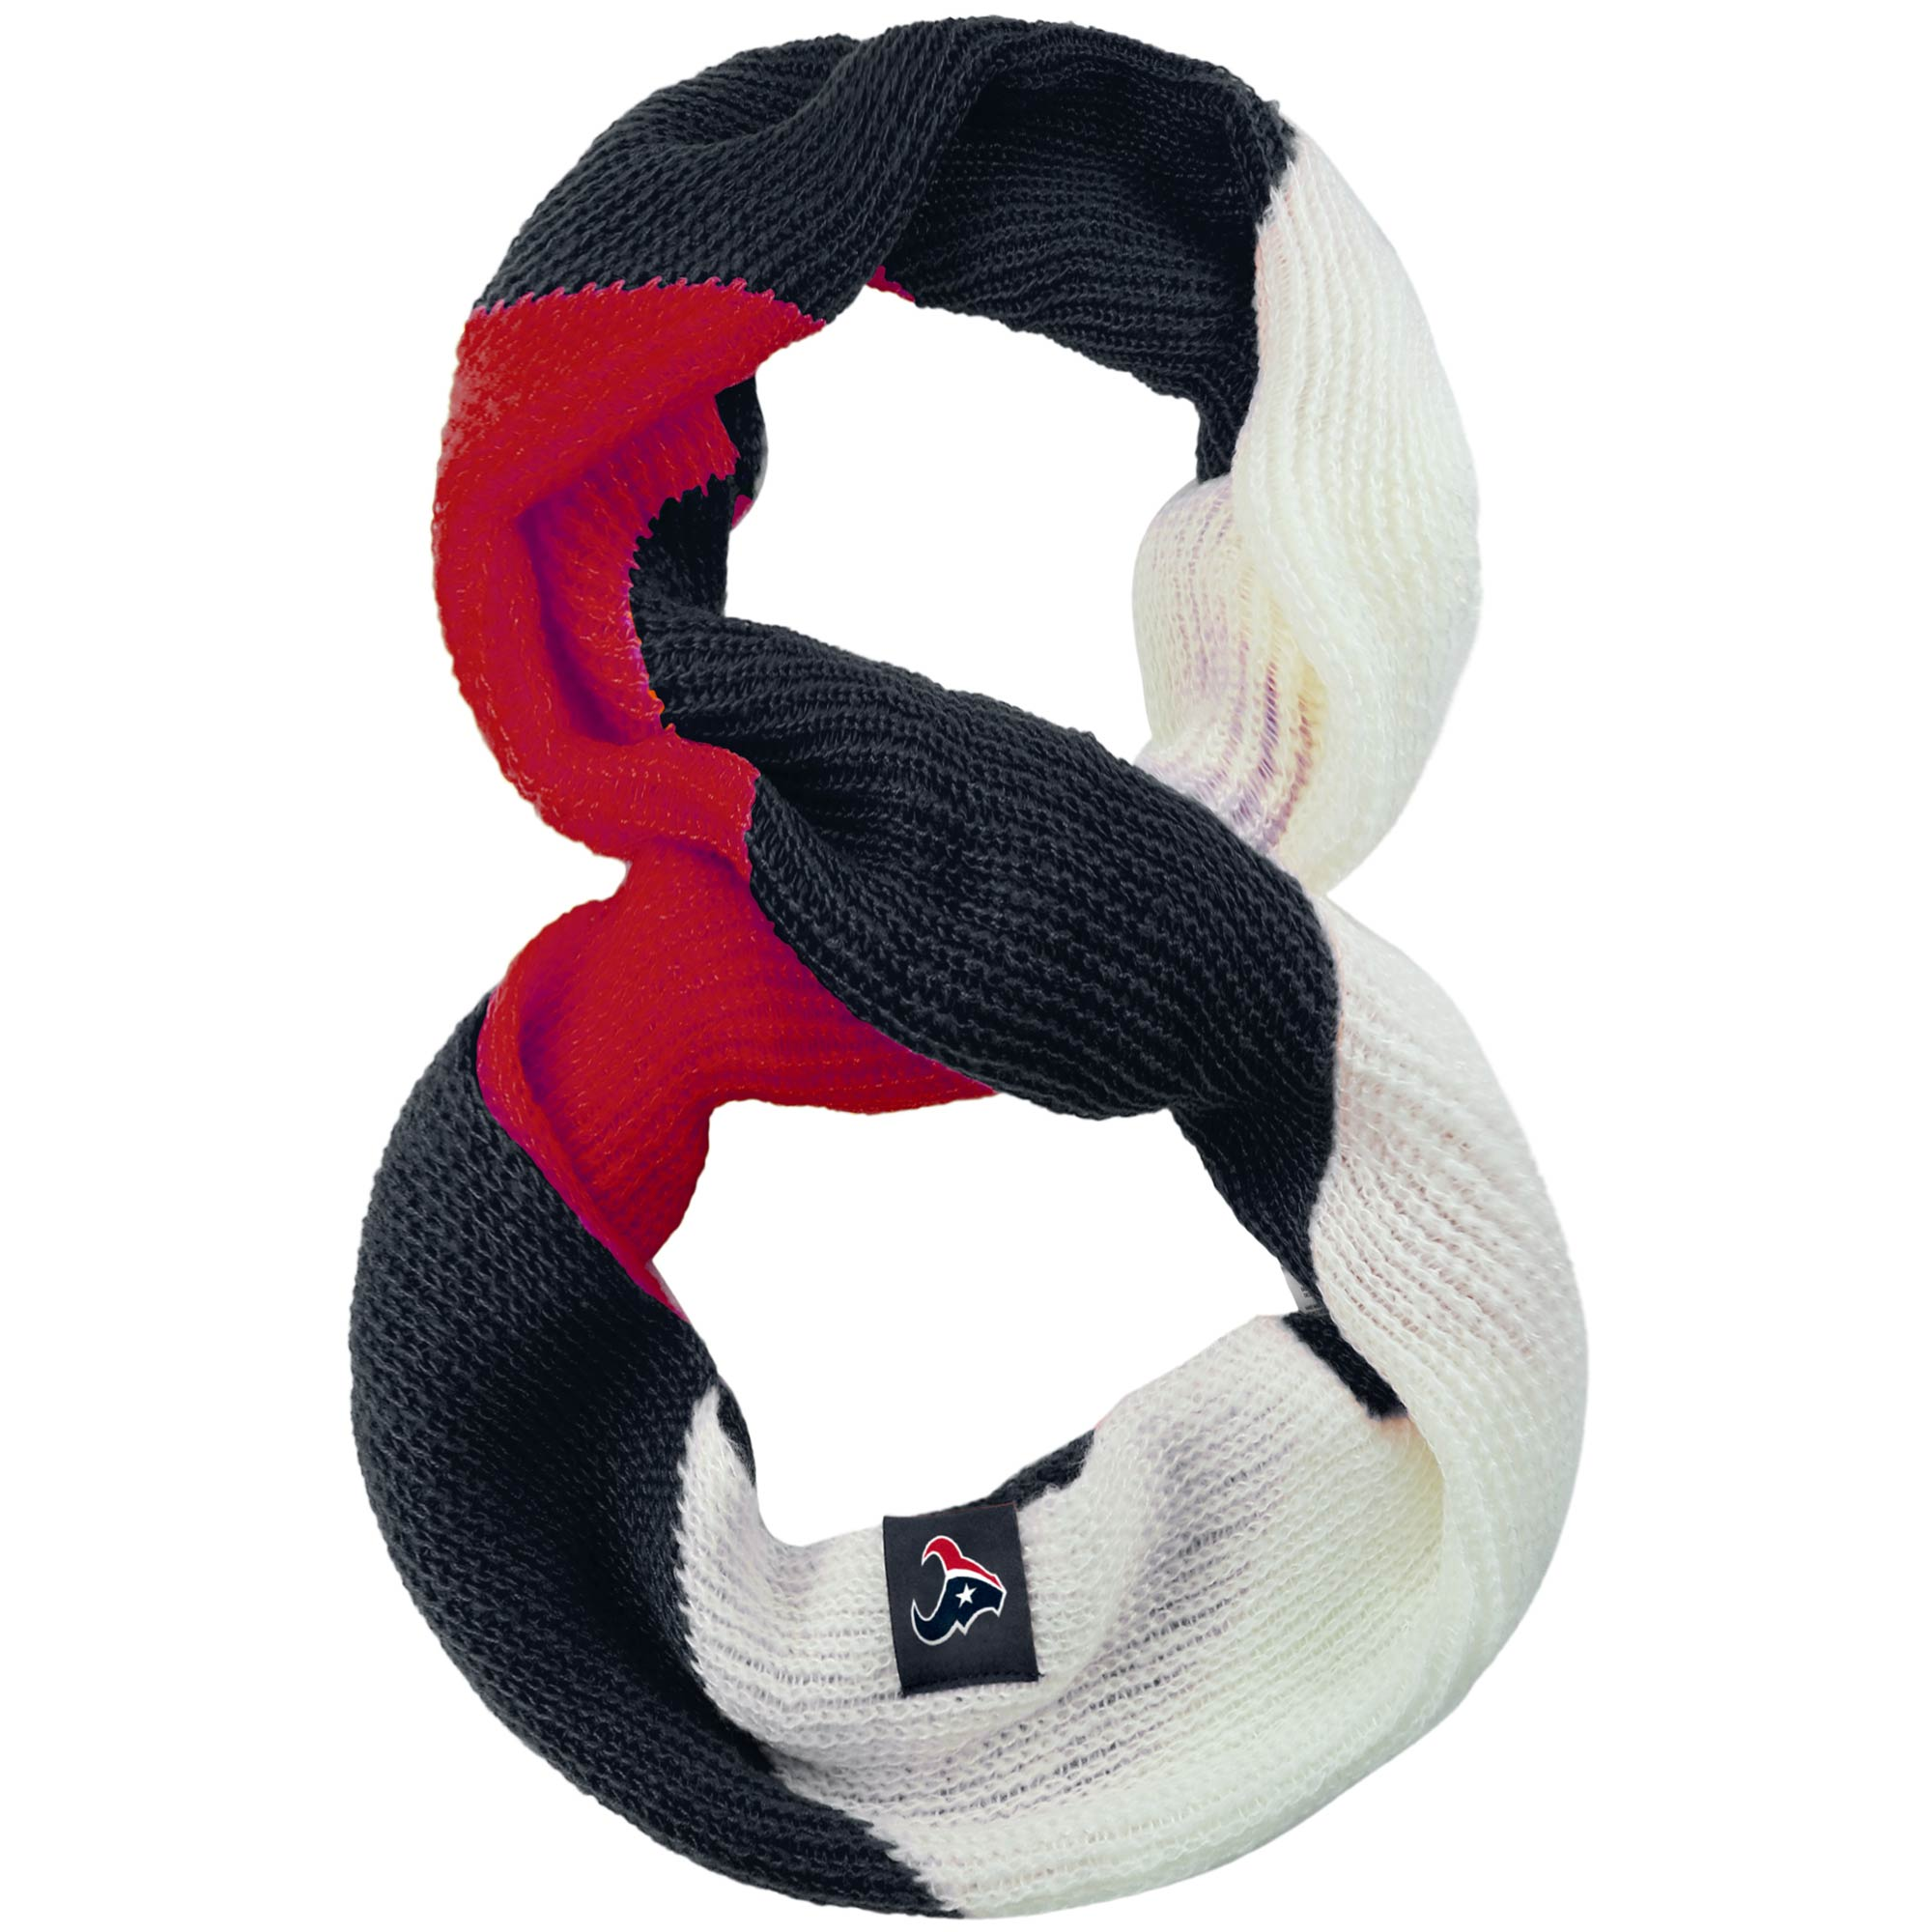 Houston Texans Women's Color Block Knit Infinity Scarf